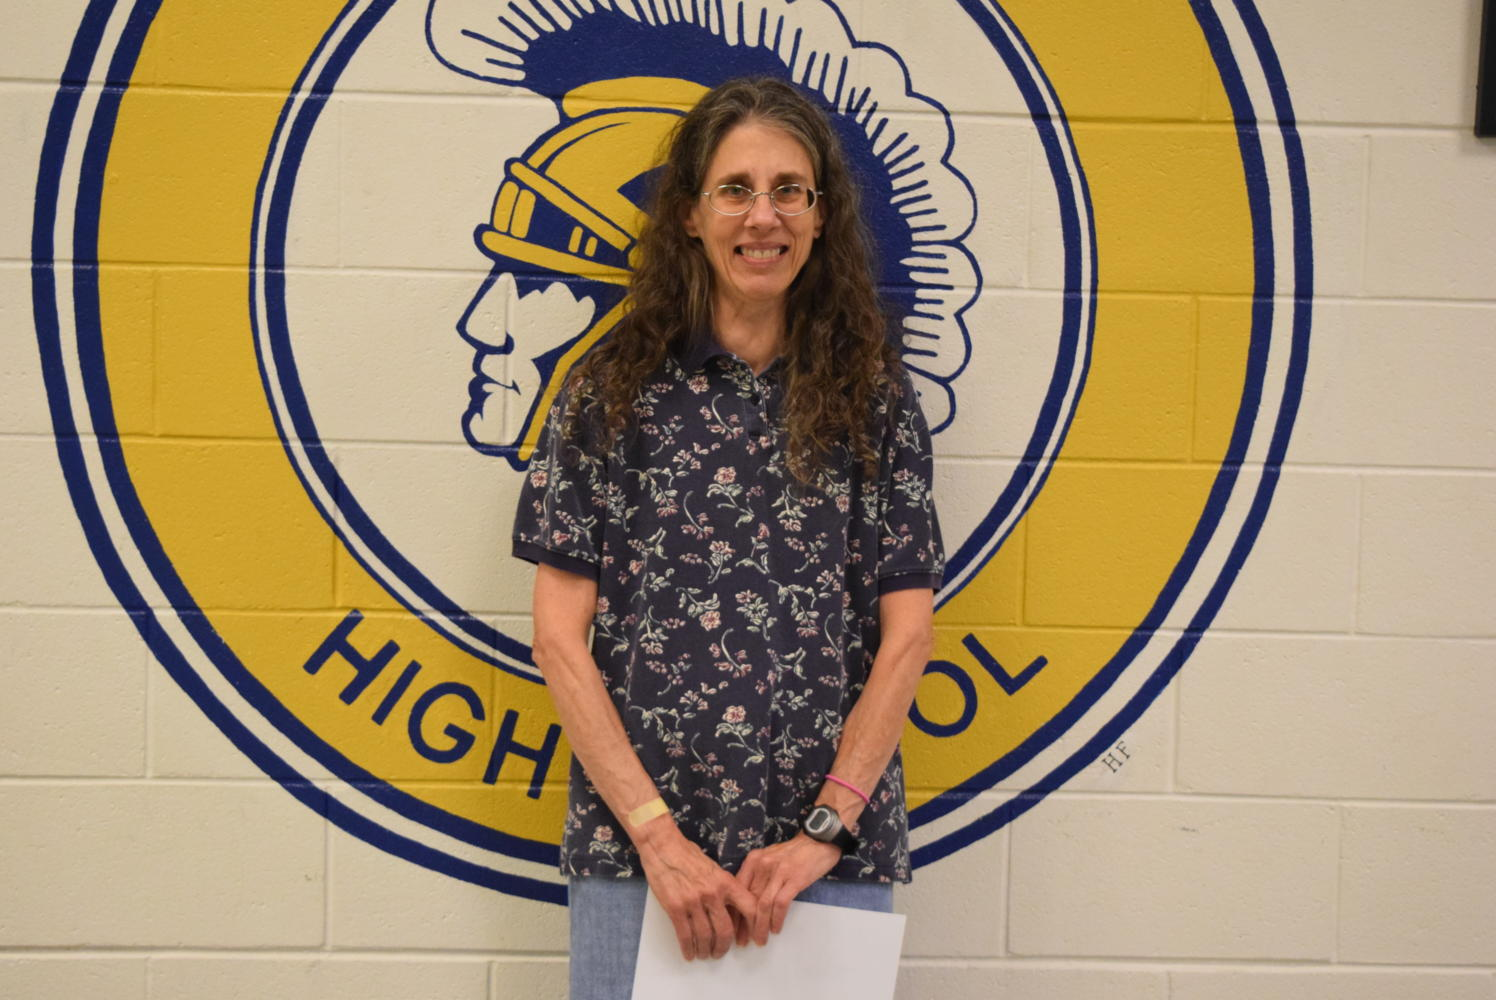 September Community Member of the Month: Ms. Tina Walke